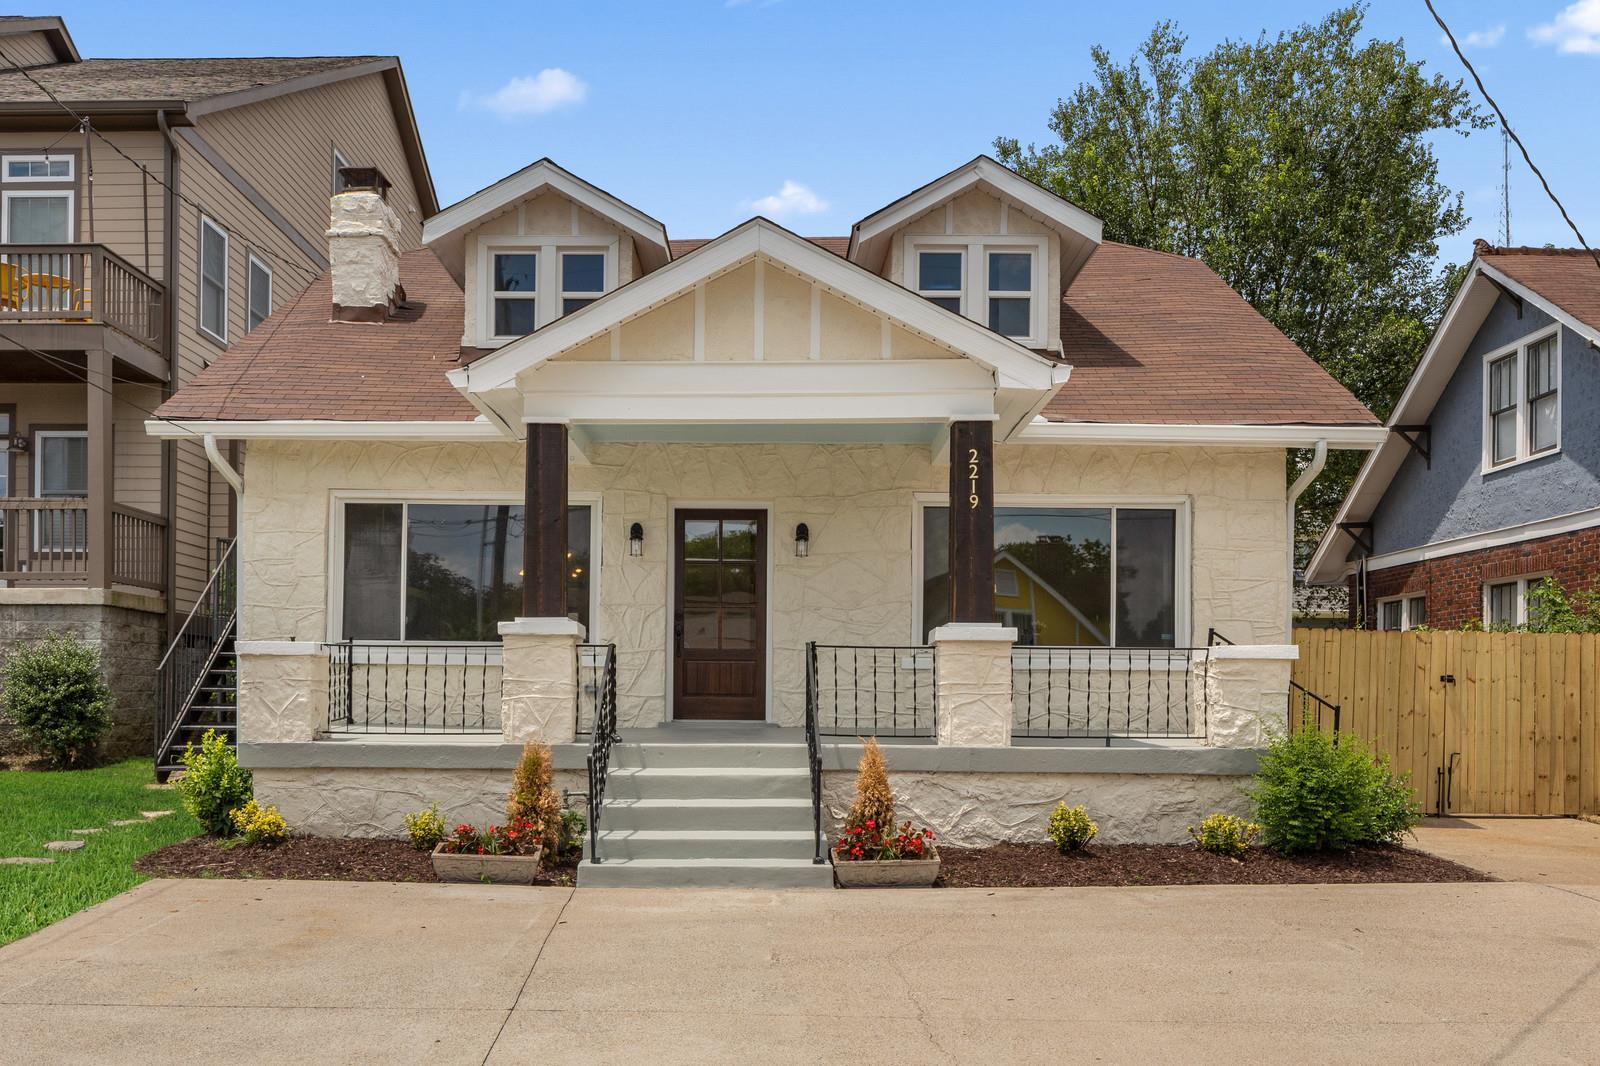 2219 10Th Ave S, S, Nashville, TN 37204 - Nashville, TN real estate listing